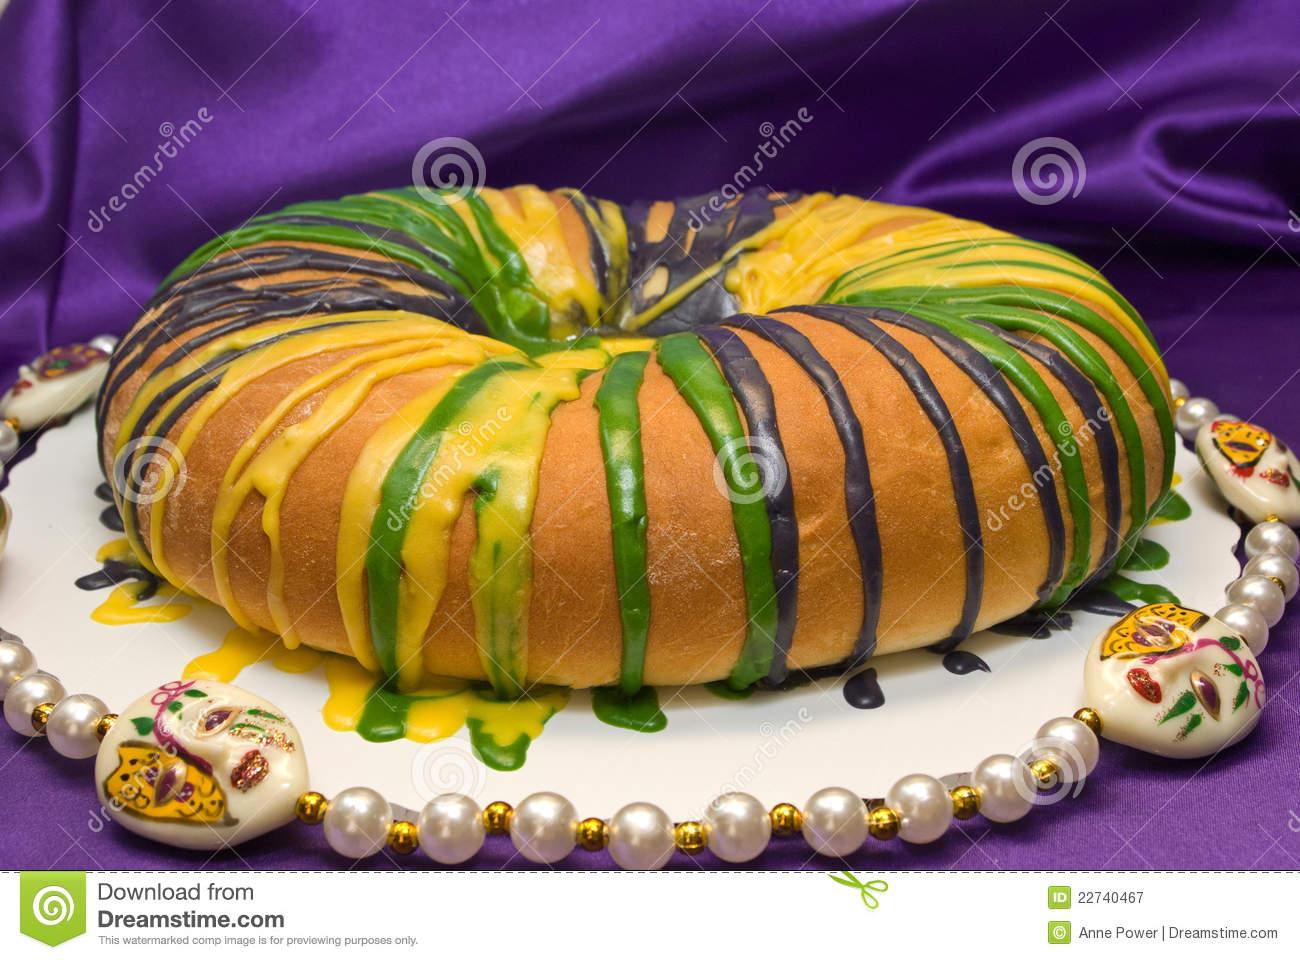 King Cake Clipart.